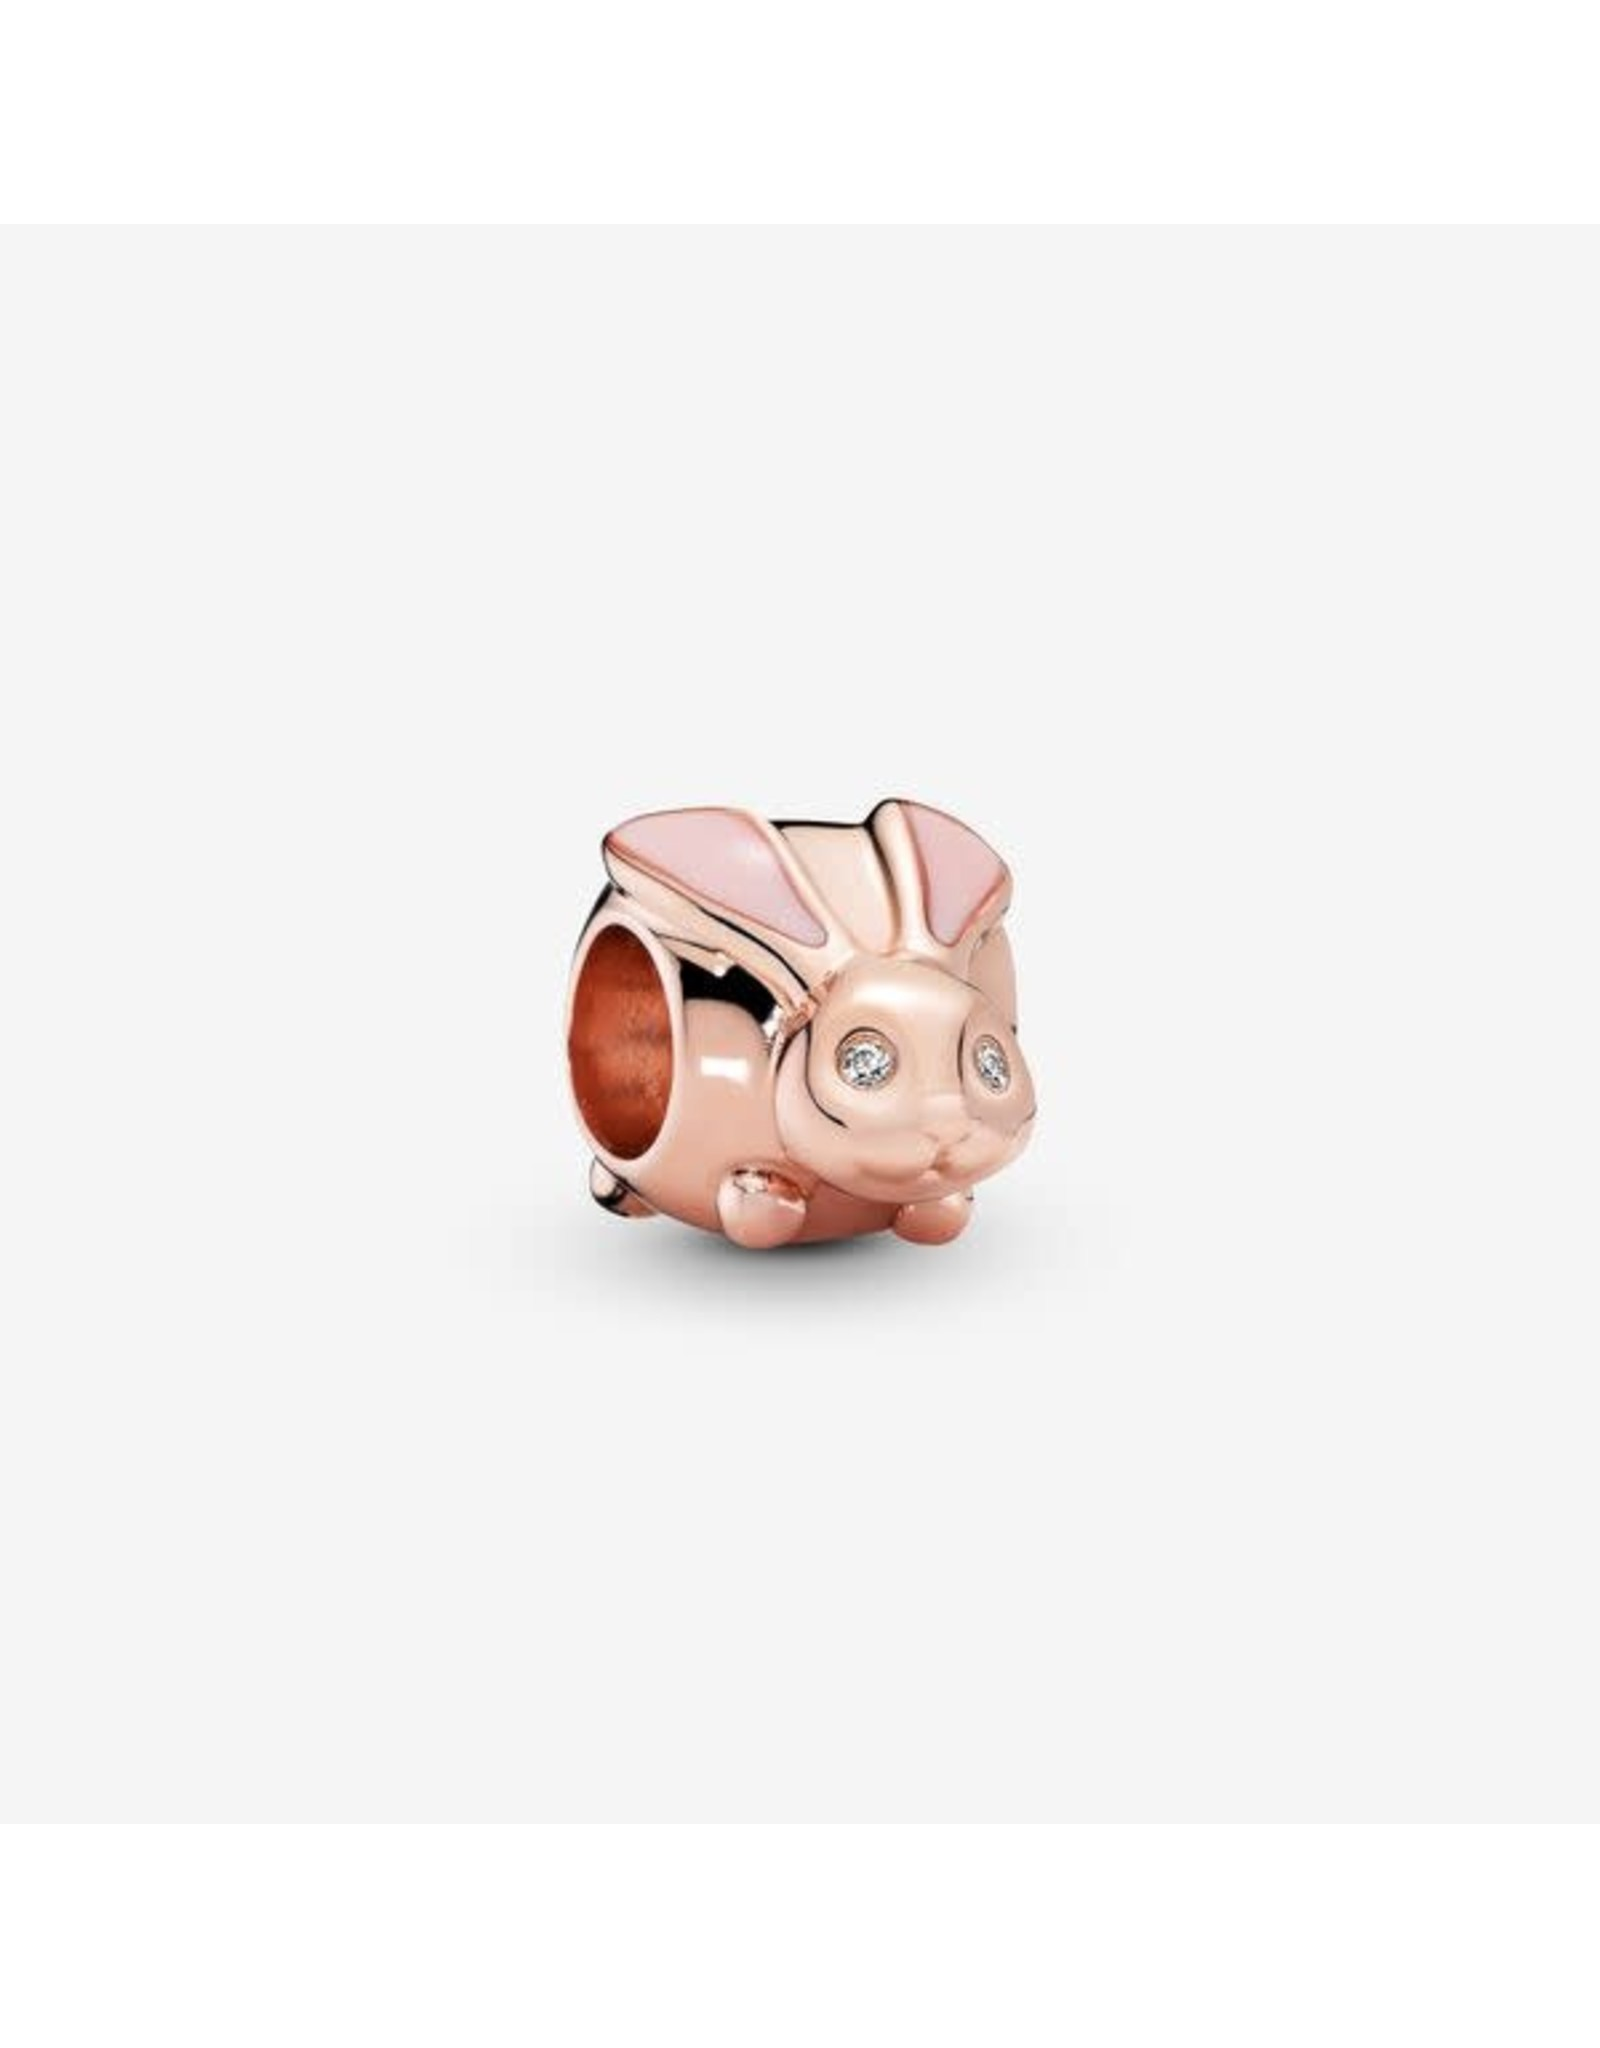 Pandora Pandora Charm,787061EN160, Rose Gold,Cute Bunny, Pink Enamel & Clear CZ